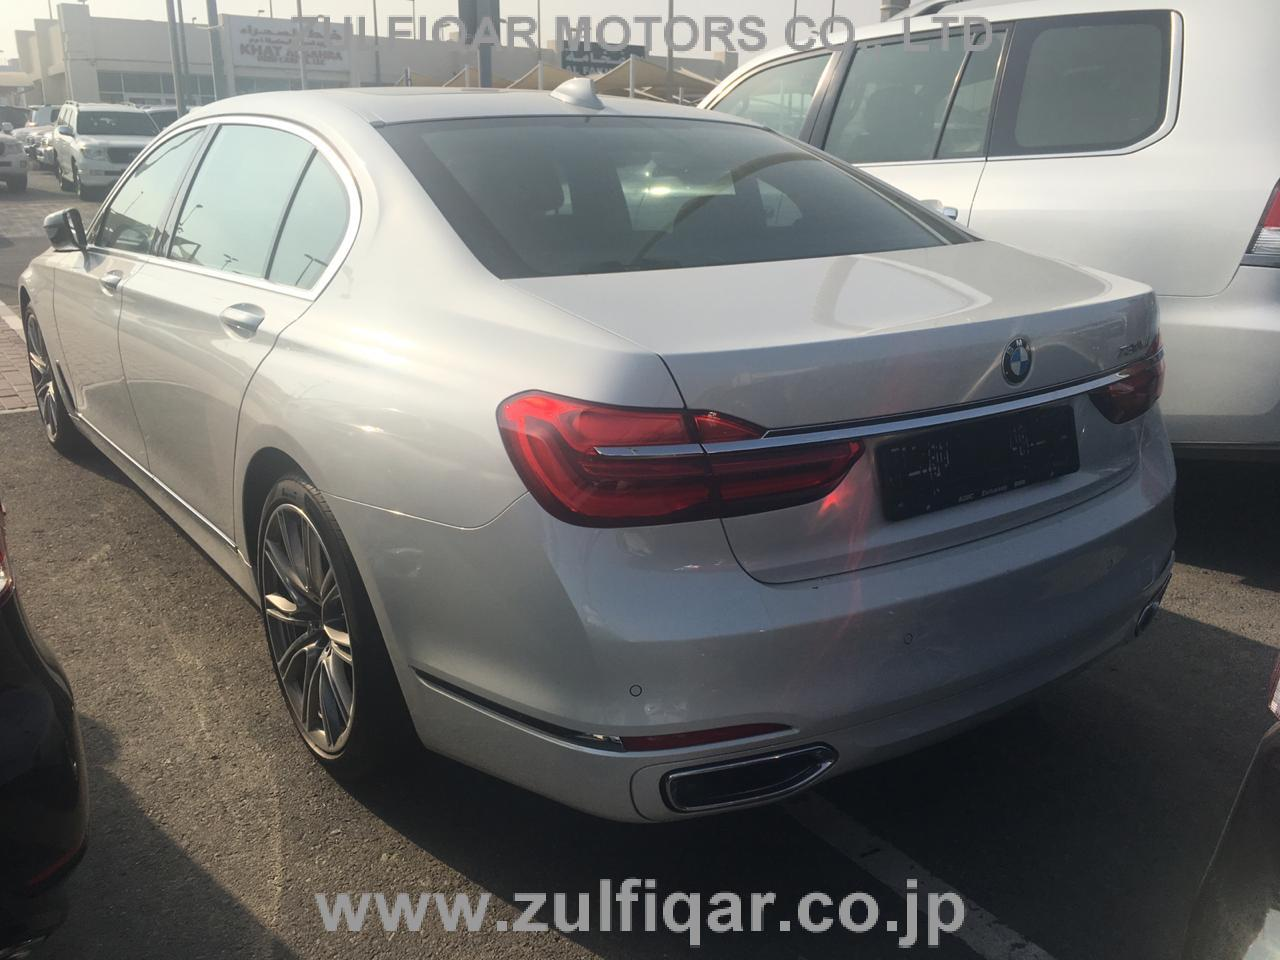 BMW 7 SERIES 2017 Image 6